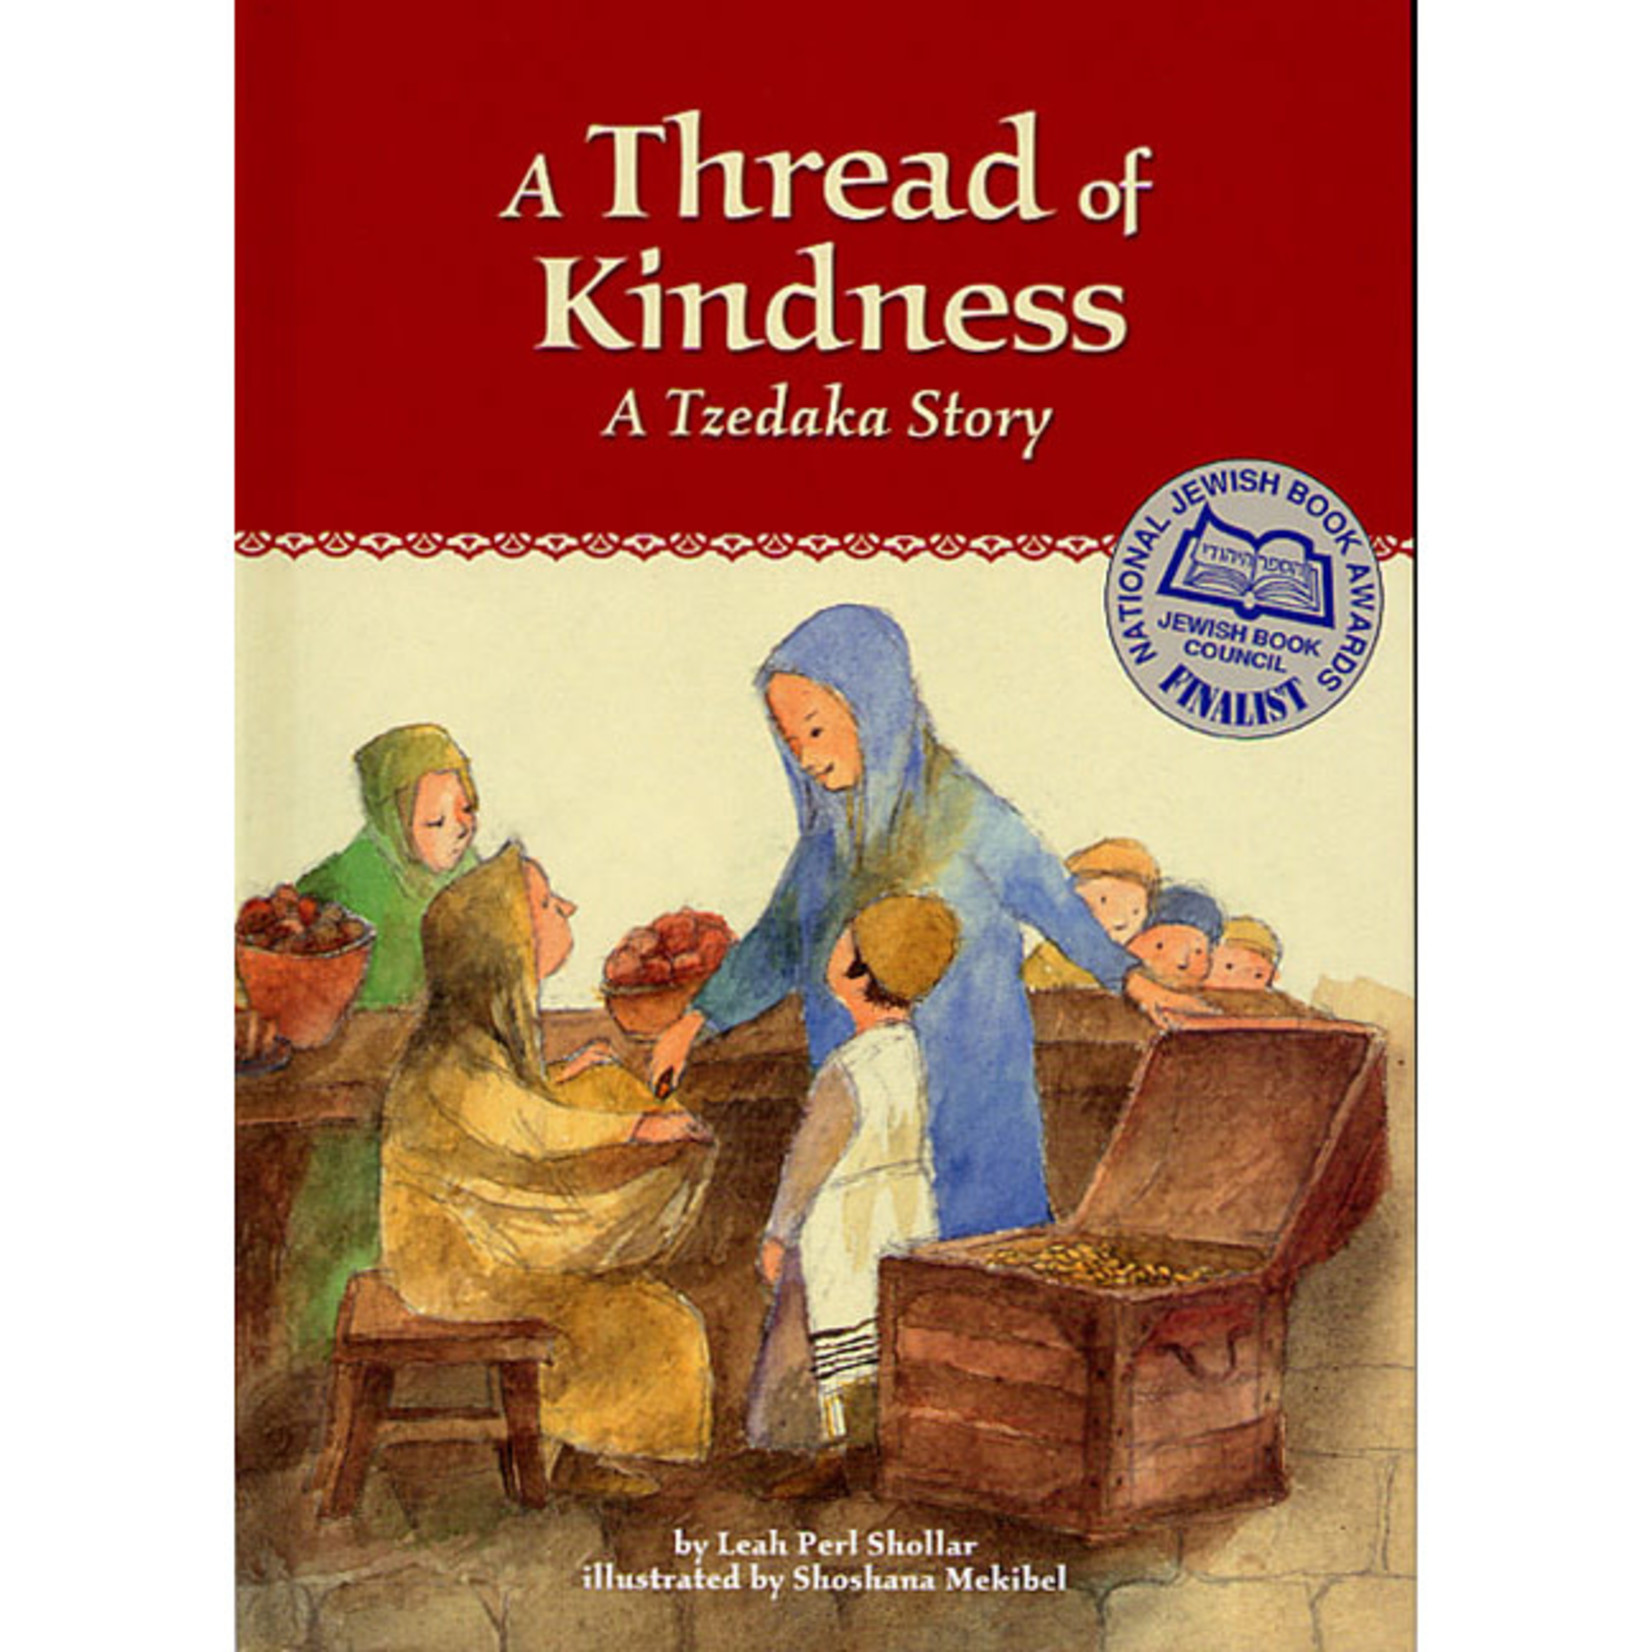 A Thread of Kindness - A Tzedakah Story